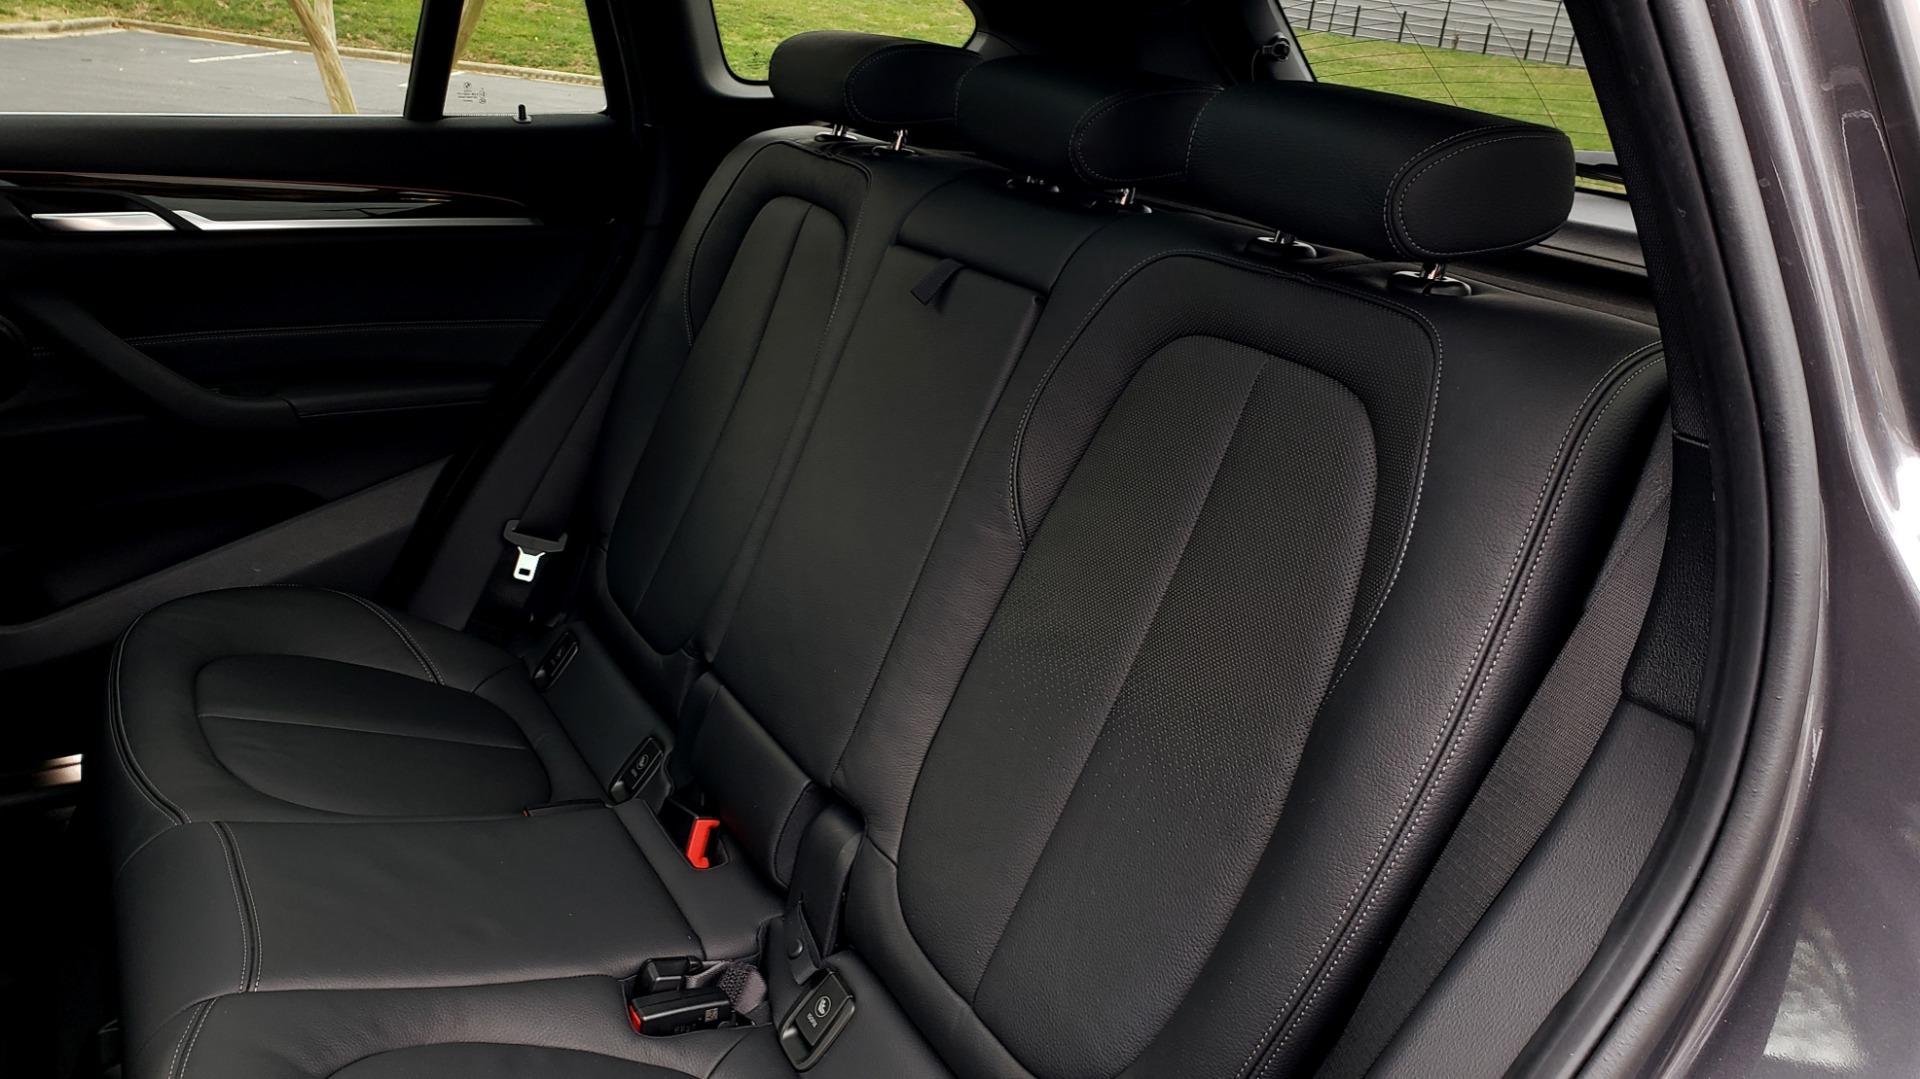 Used 2017 BMW X1 XDRIVE28I / PREM PKG / DRIVER ASST / NAV / CLD WTHR for sale Sold at Formula Imports in Charlotte NC 28227 65